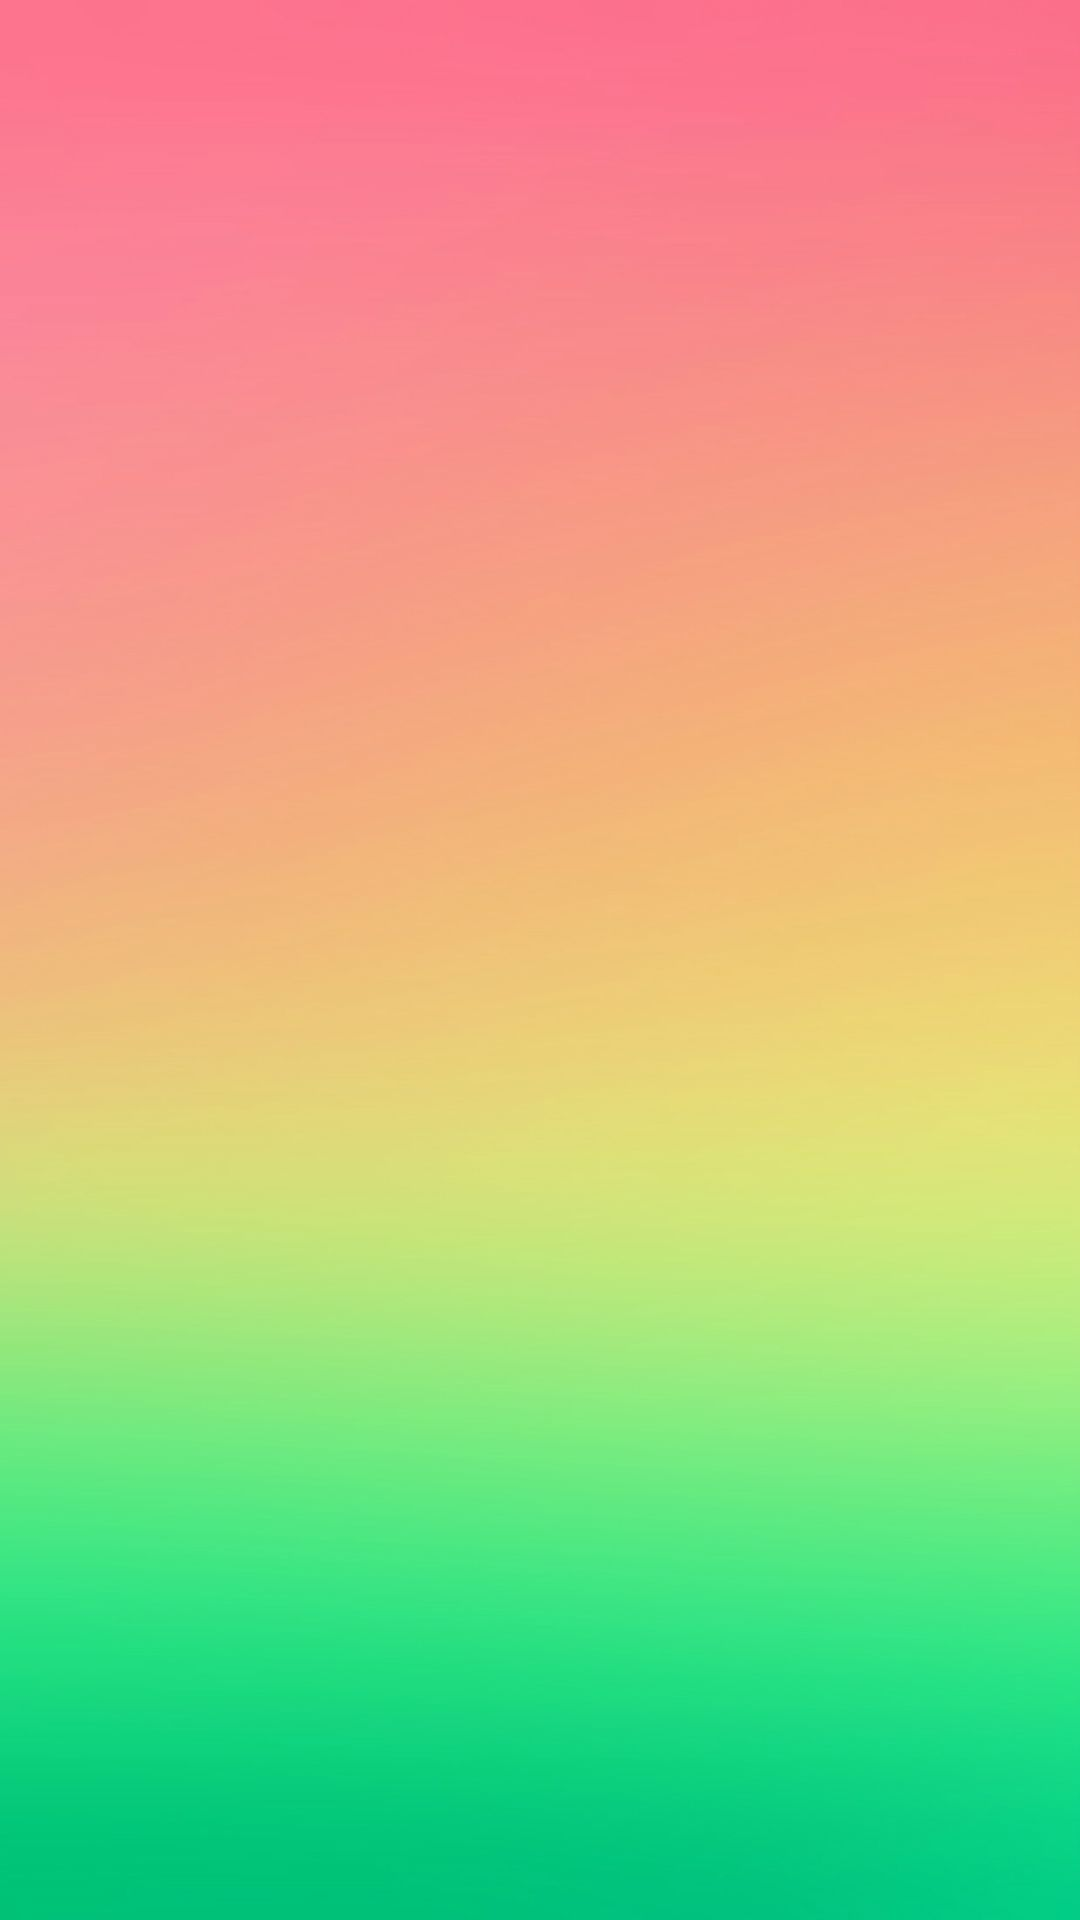 HD Wallpaper Iphone Tumblr Green  wallpaper lucu